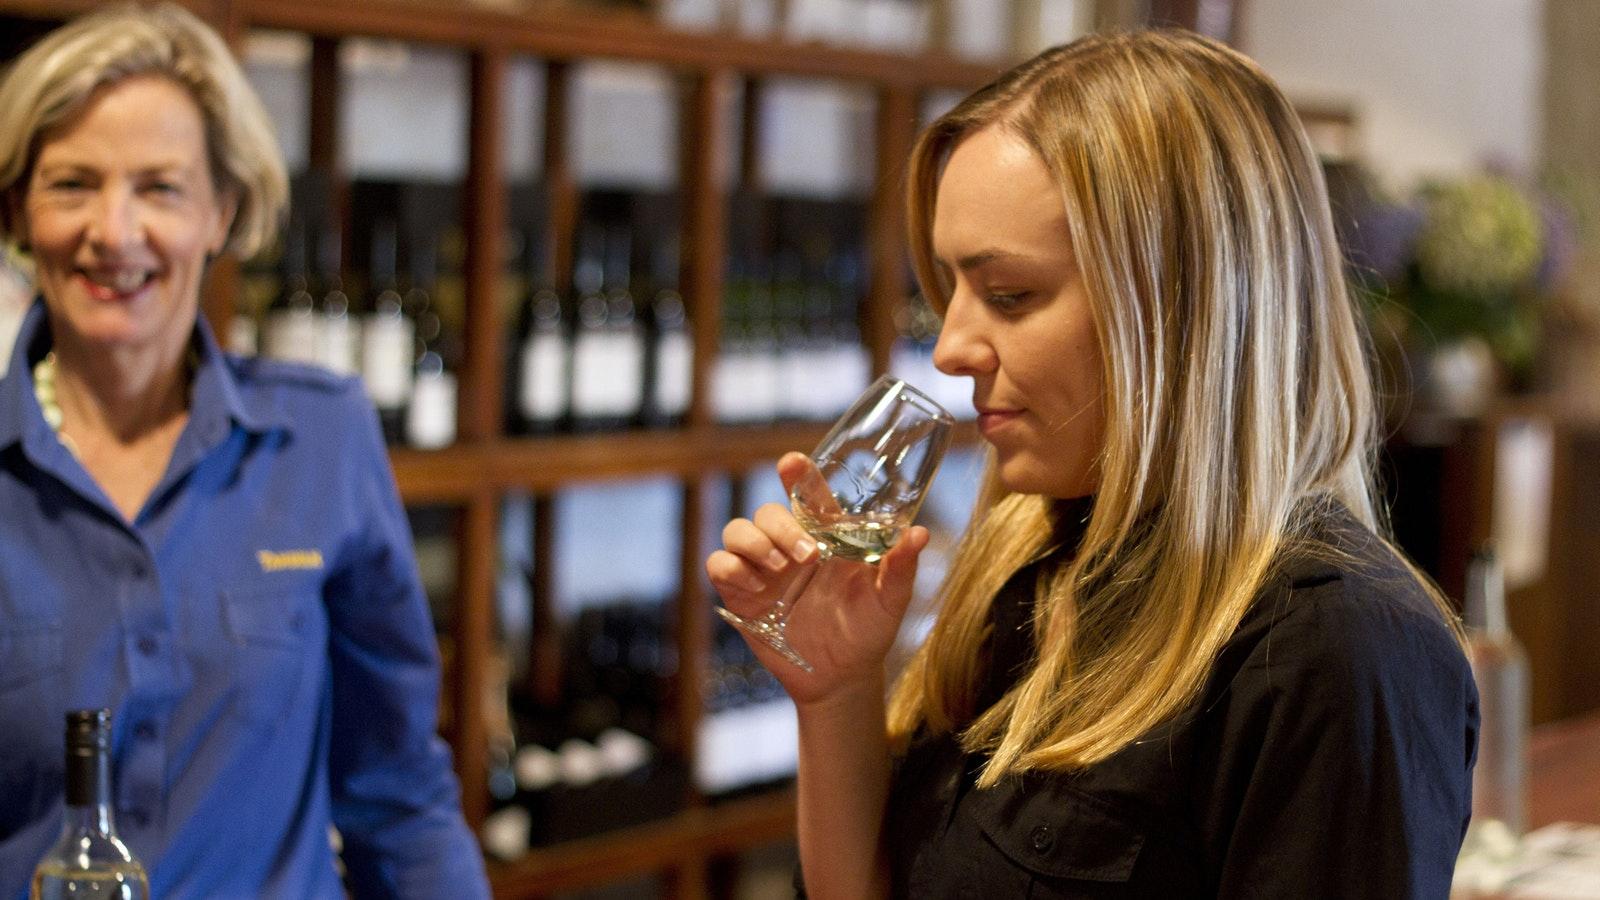 Tasting wines at Cellar Door